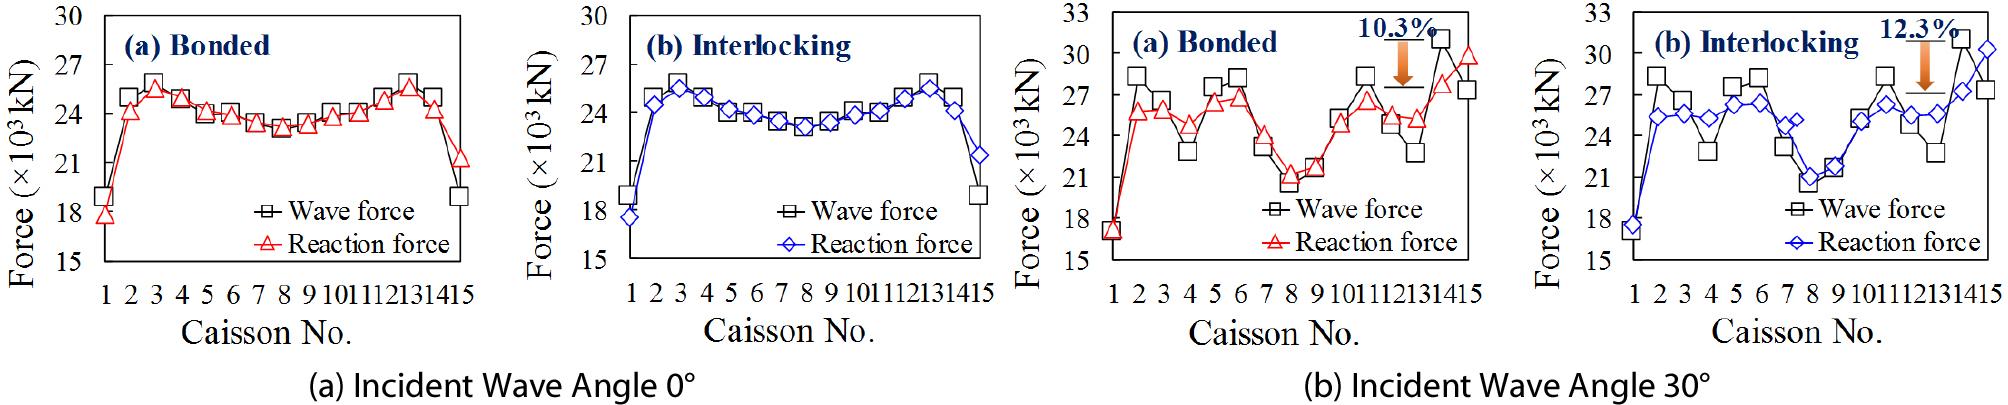 http://static.apub.kr/journalsite/sites/ksce/2019-039-01/N0110390120/images/Figure_KSCE_39_1_20_F12.jpg